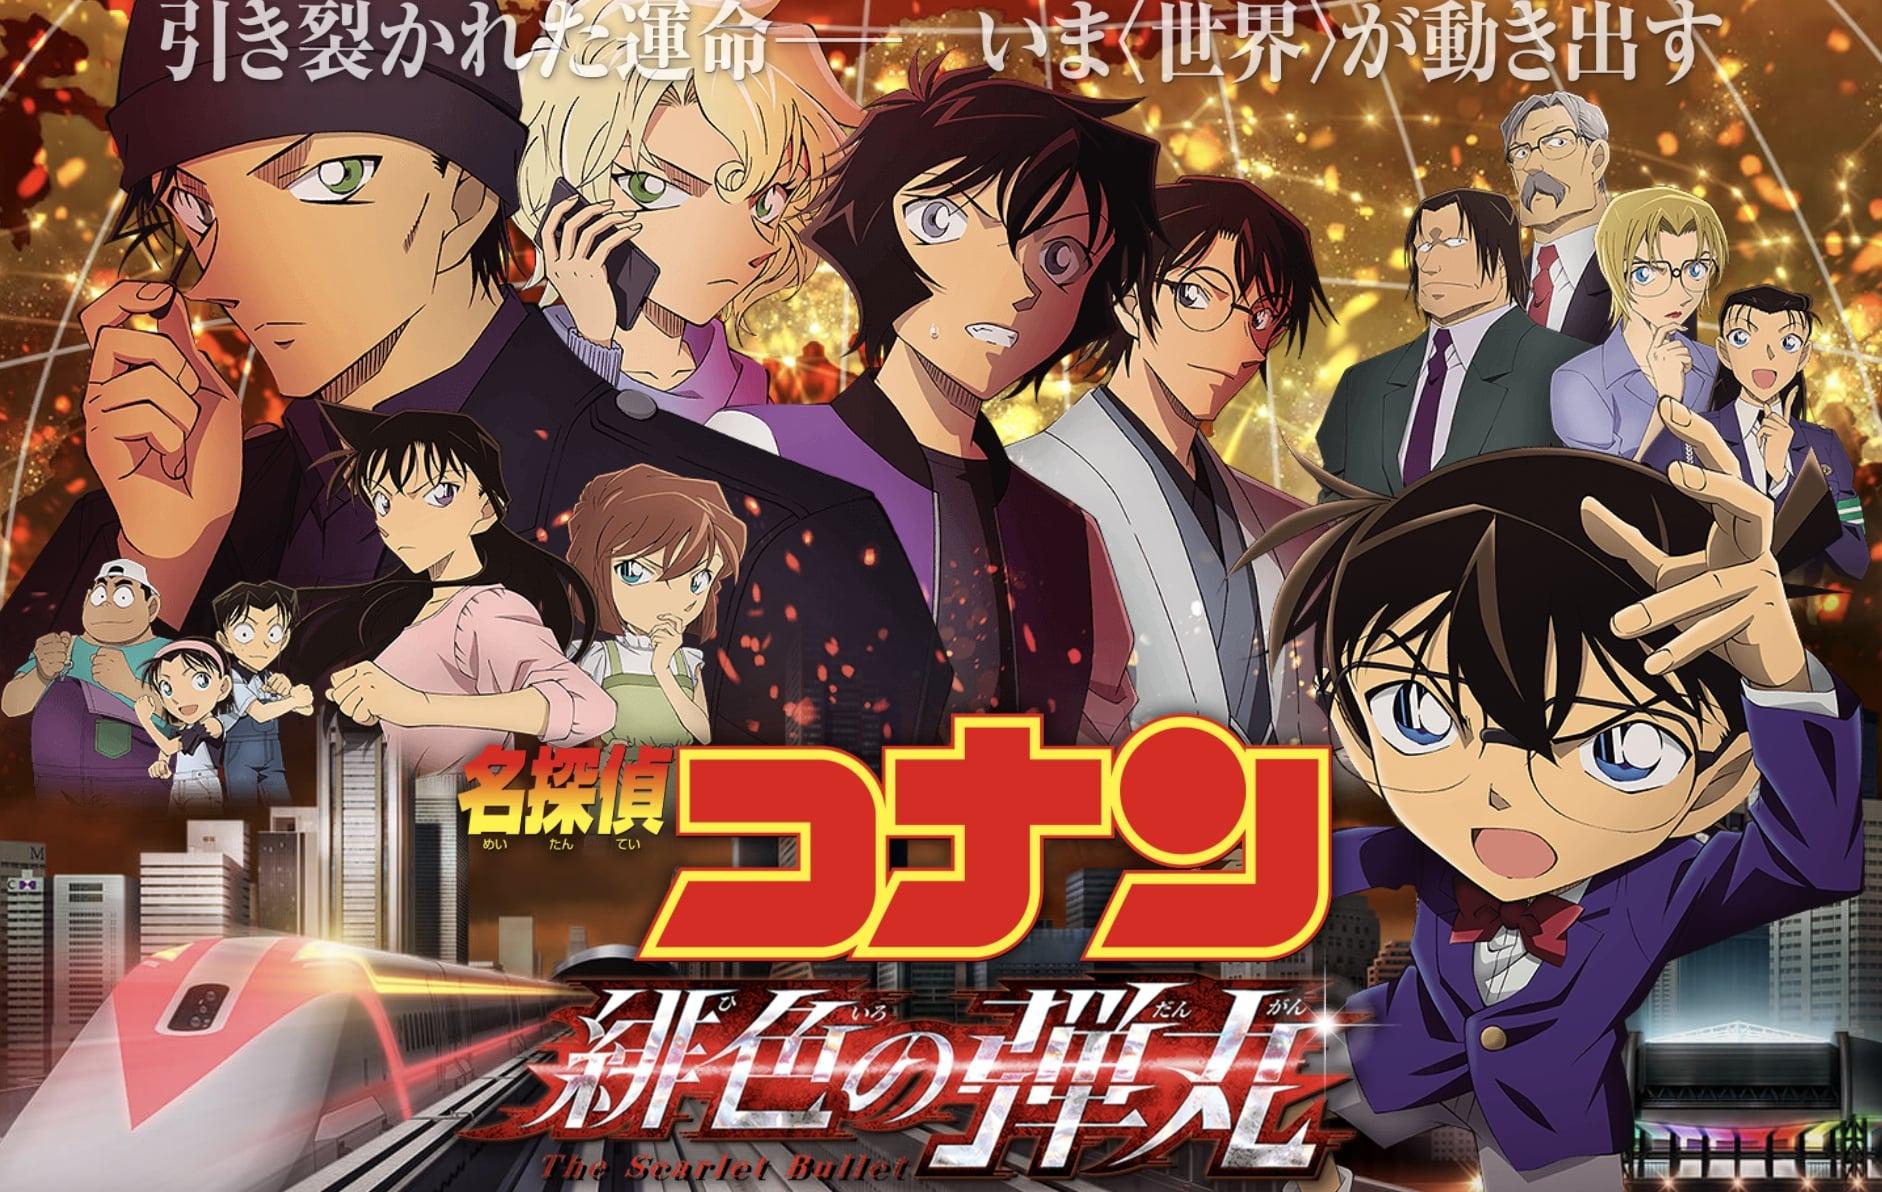 Detective Conan The Scarlet Bullet (名探偵コナン 緋色の弾丸)